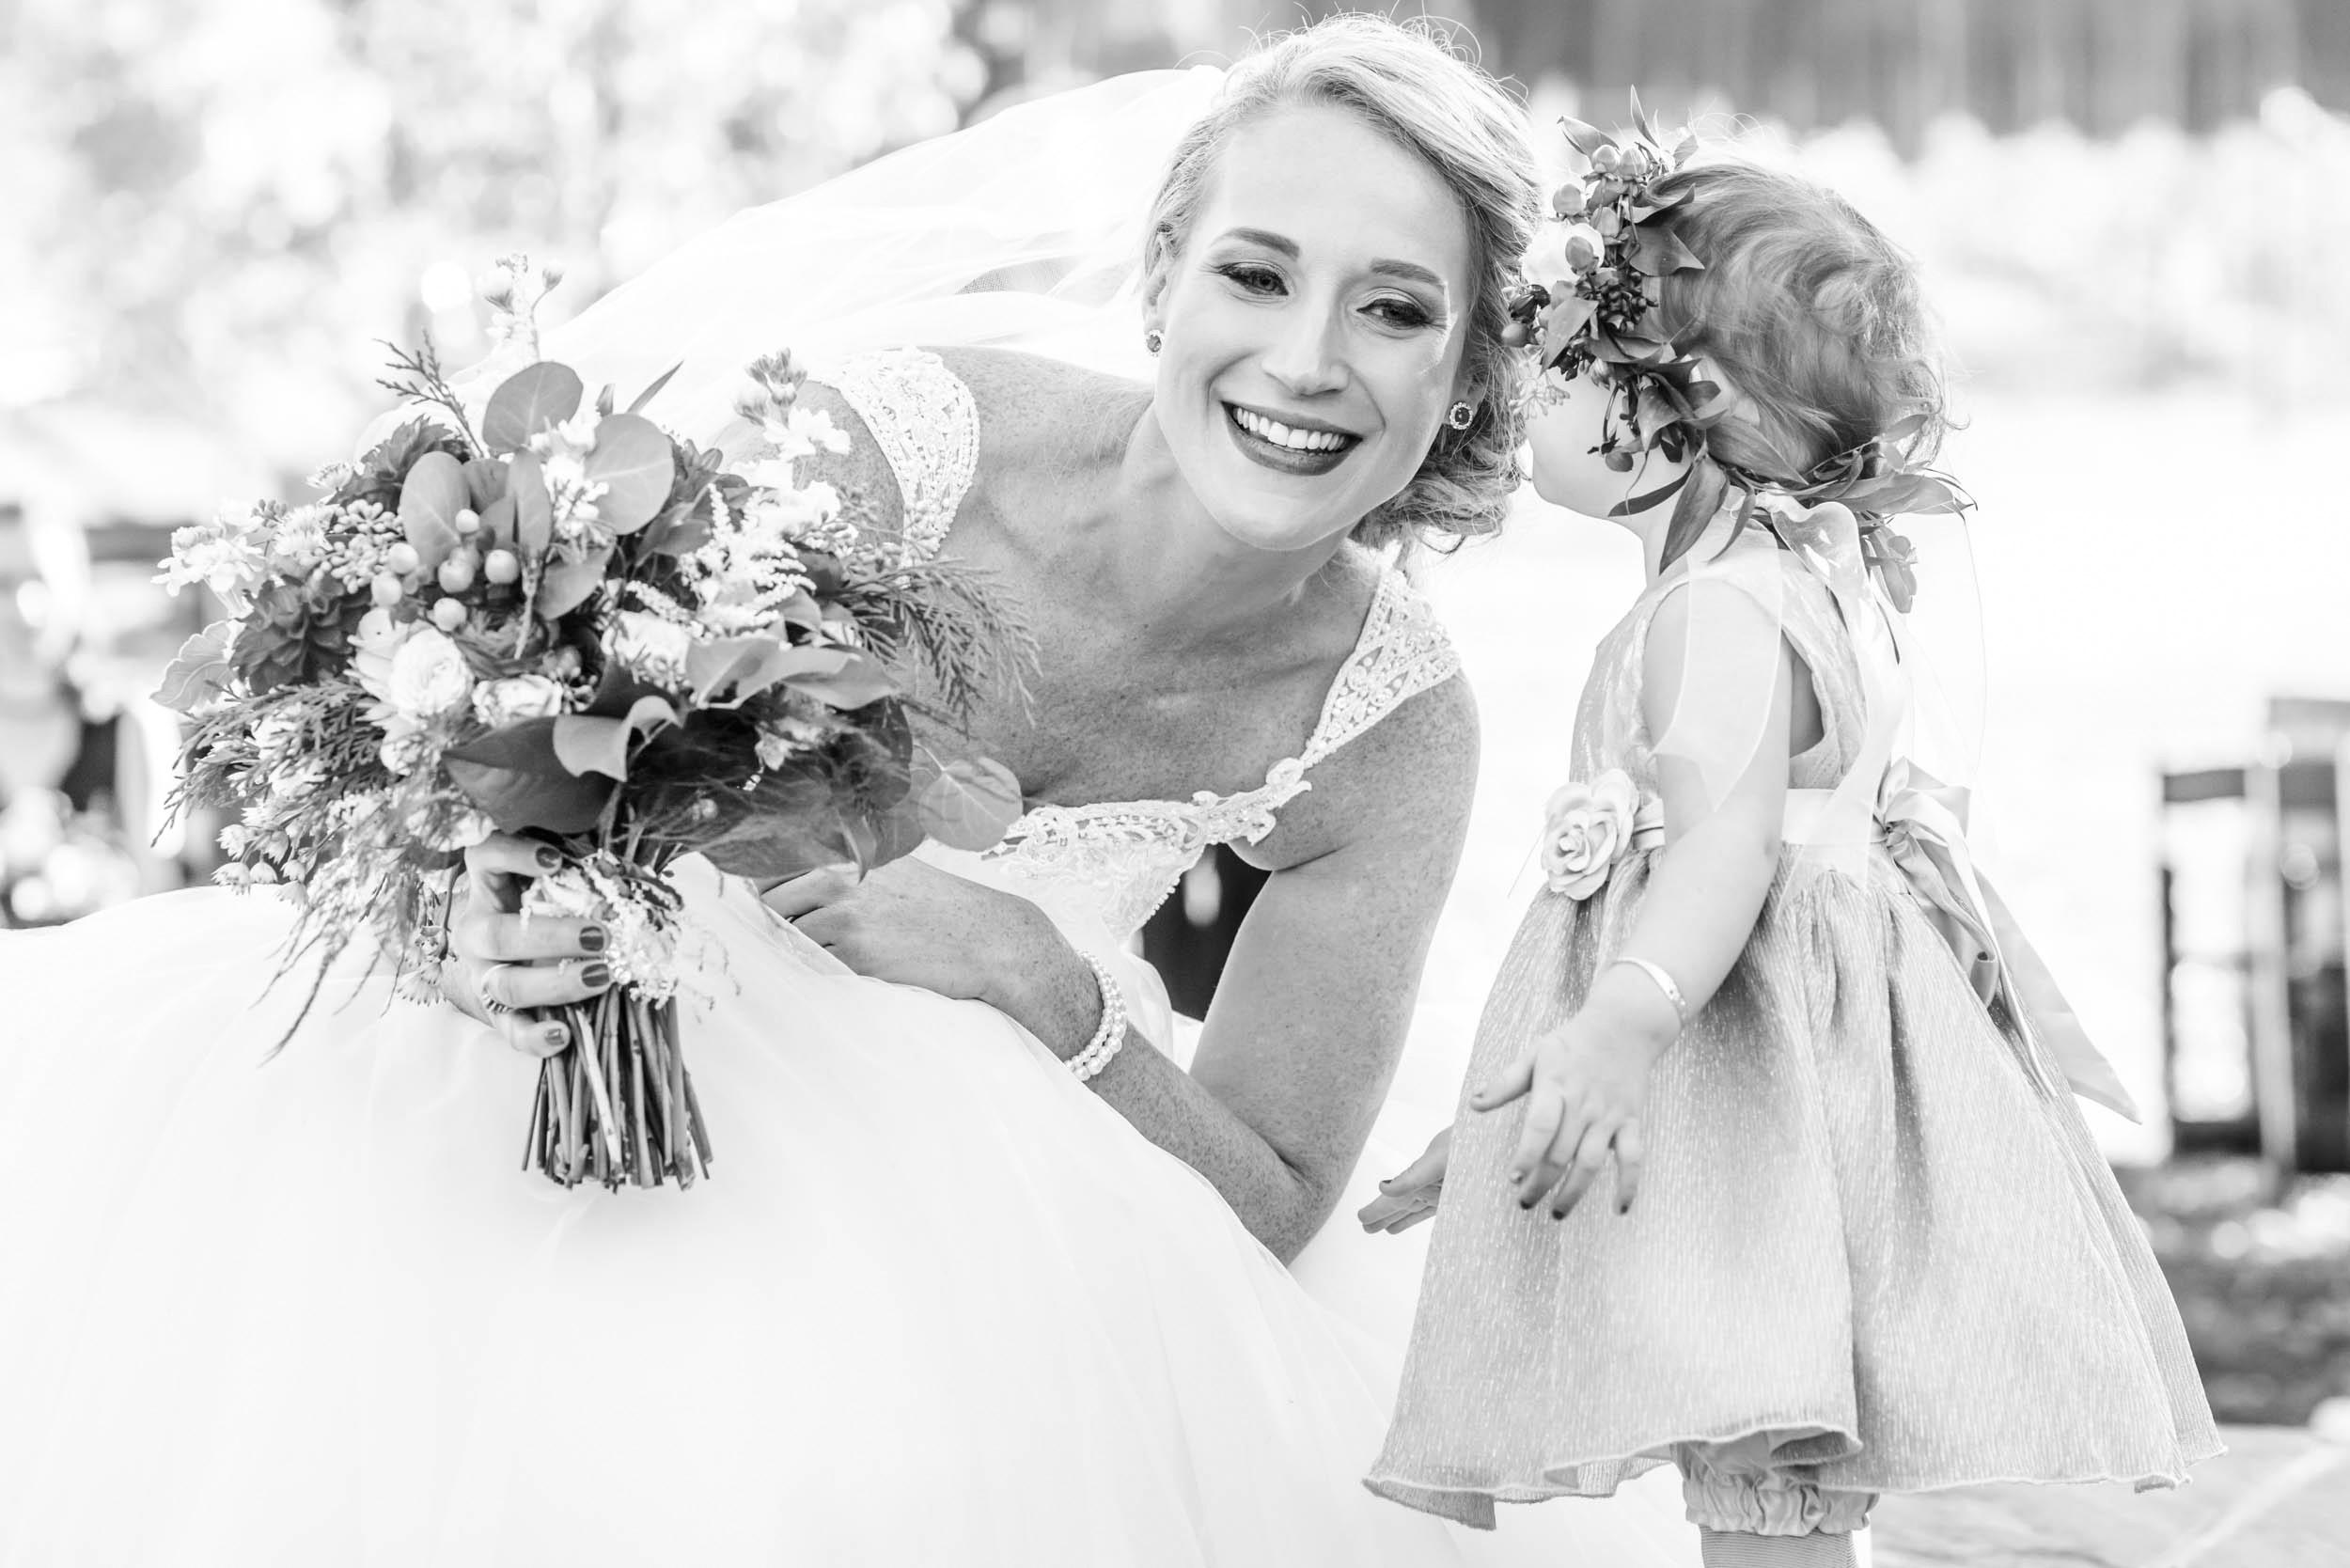 dc+metro+wedding+photographer+vadym+guliuk+photography+wedding+party-2023.jpg